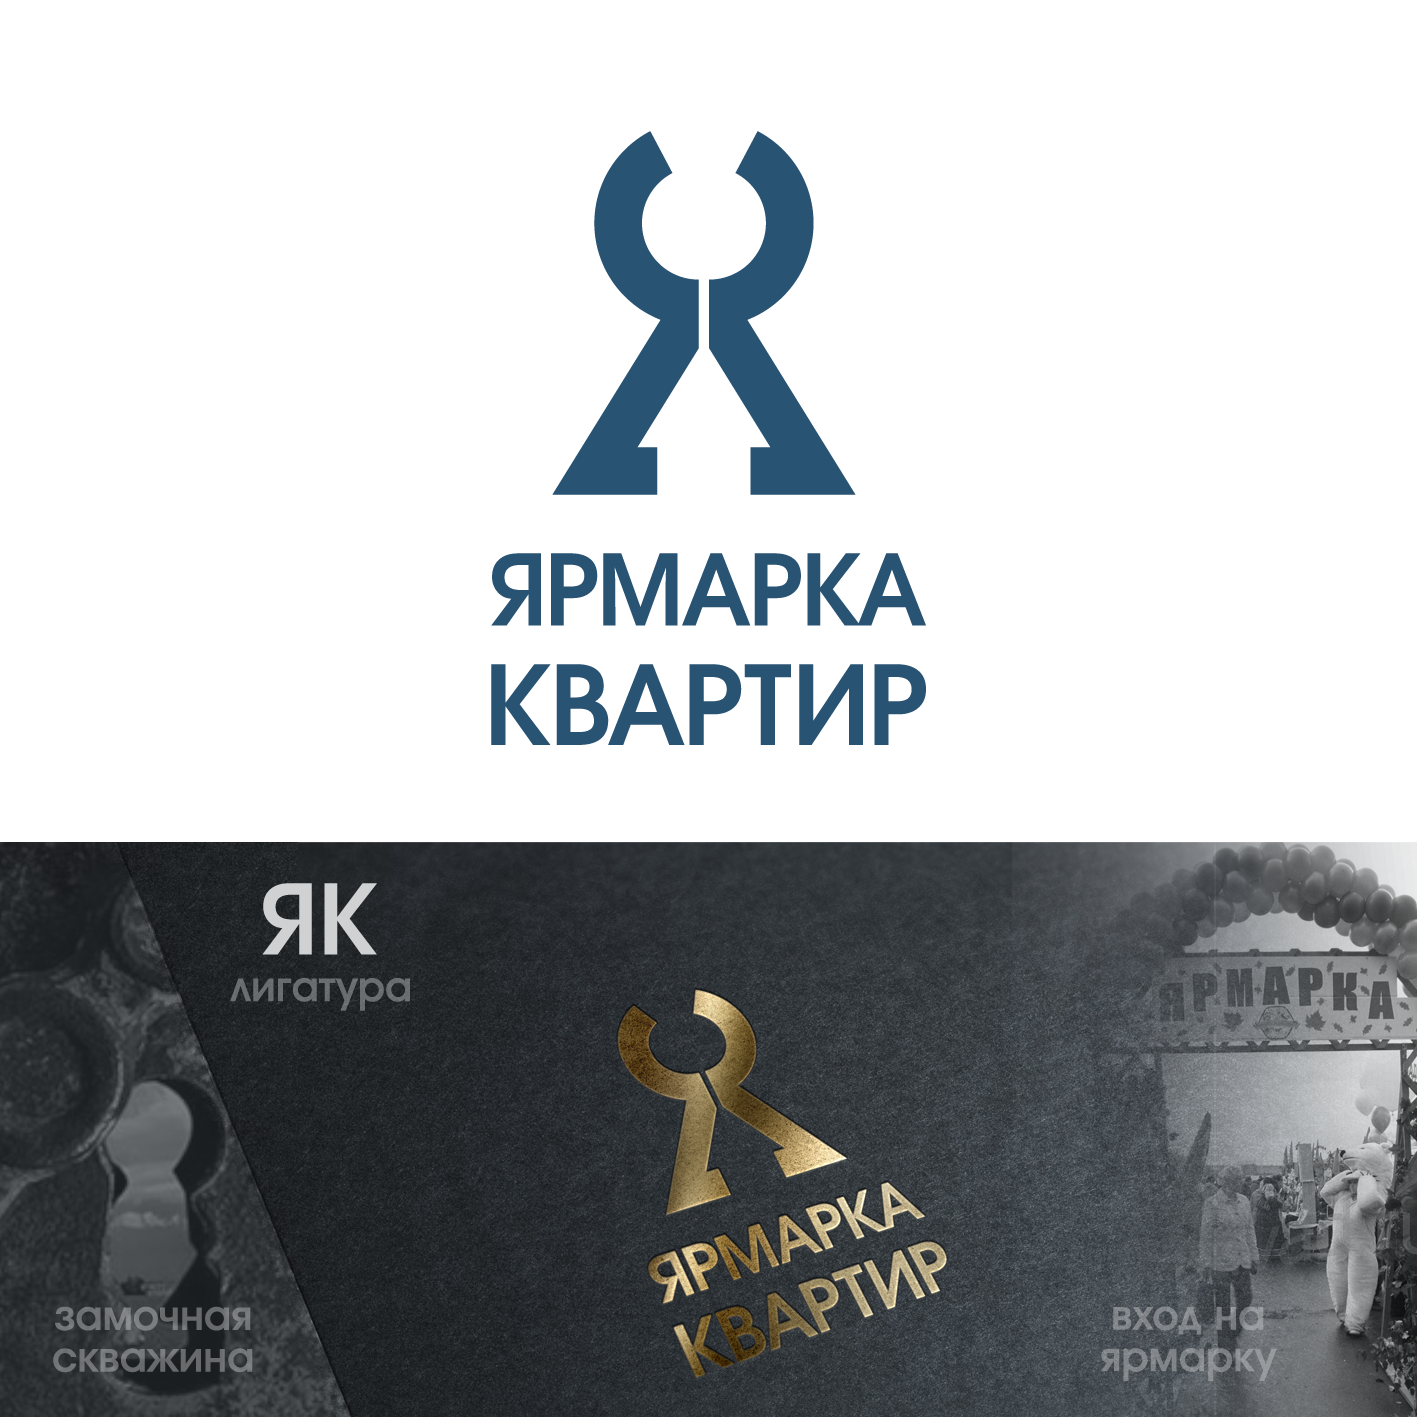 Создание логотипа, с вариантами для визитки и листовки фото f_228600411a4673ce.png